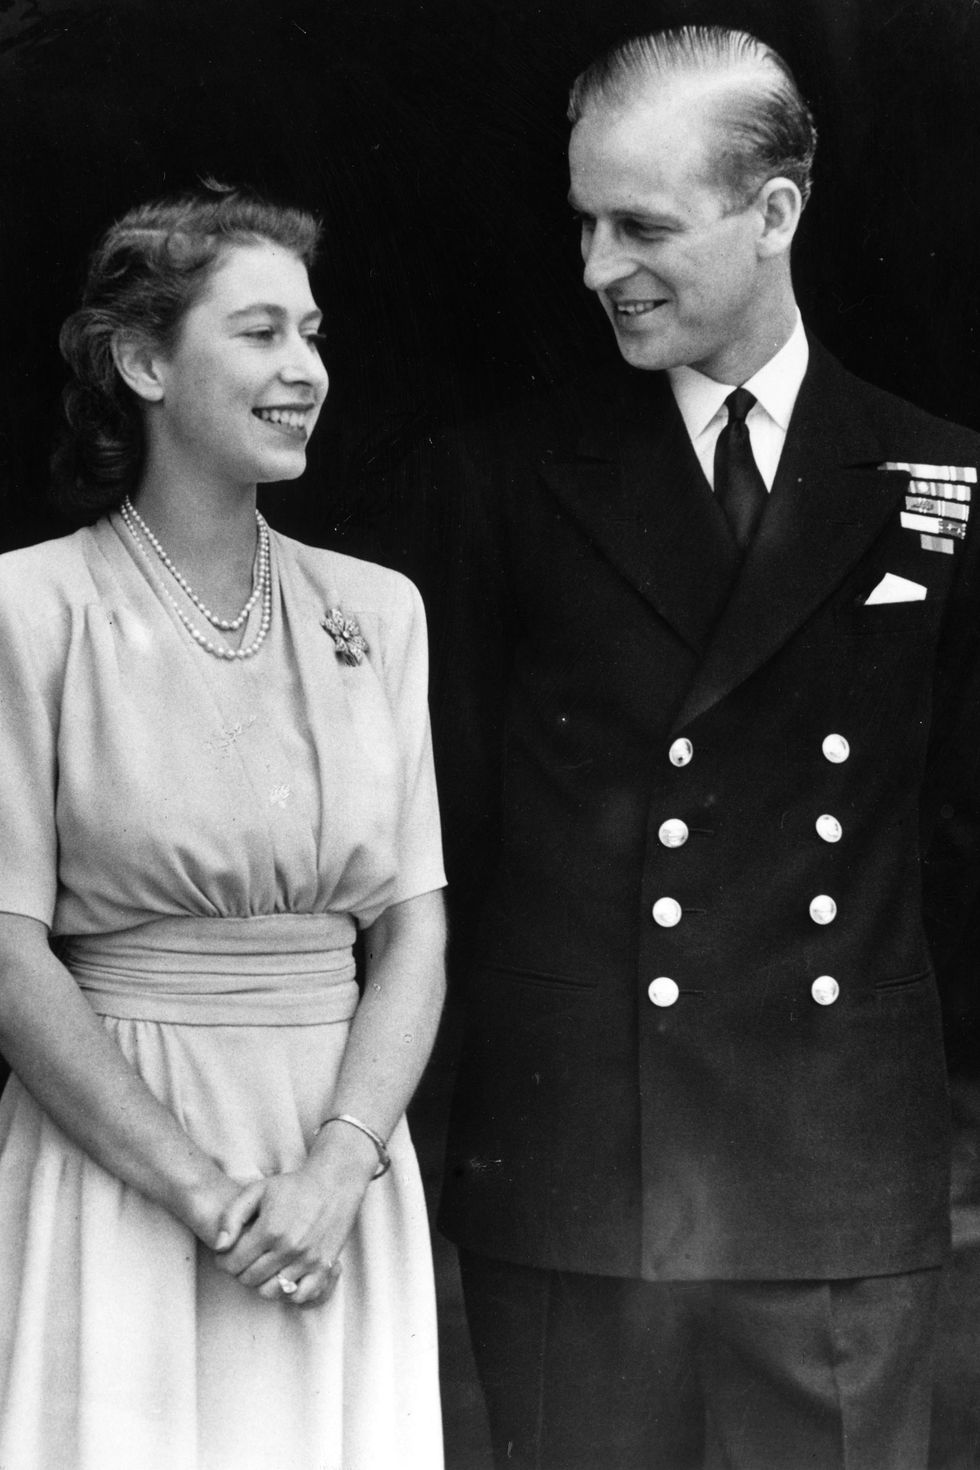 Gaya Masa Muda Ratu Elizabeth & Pangeran Philip, Bukti Couple Goals!